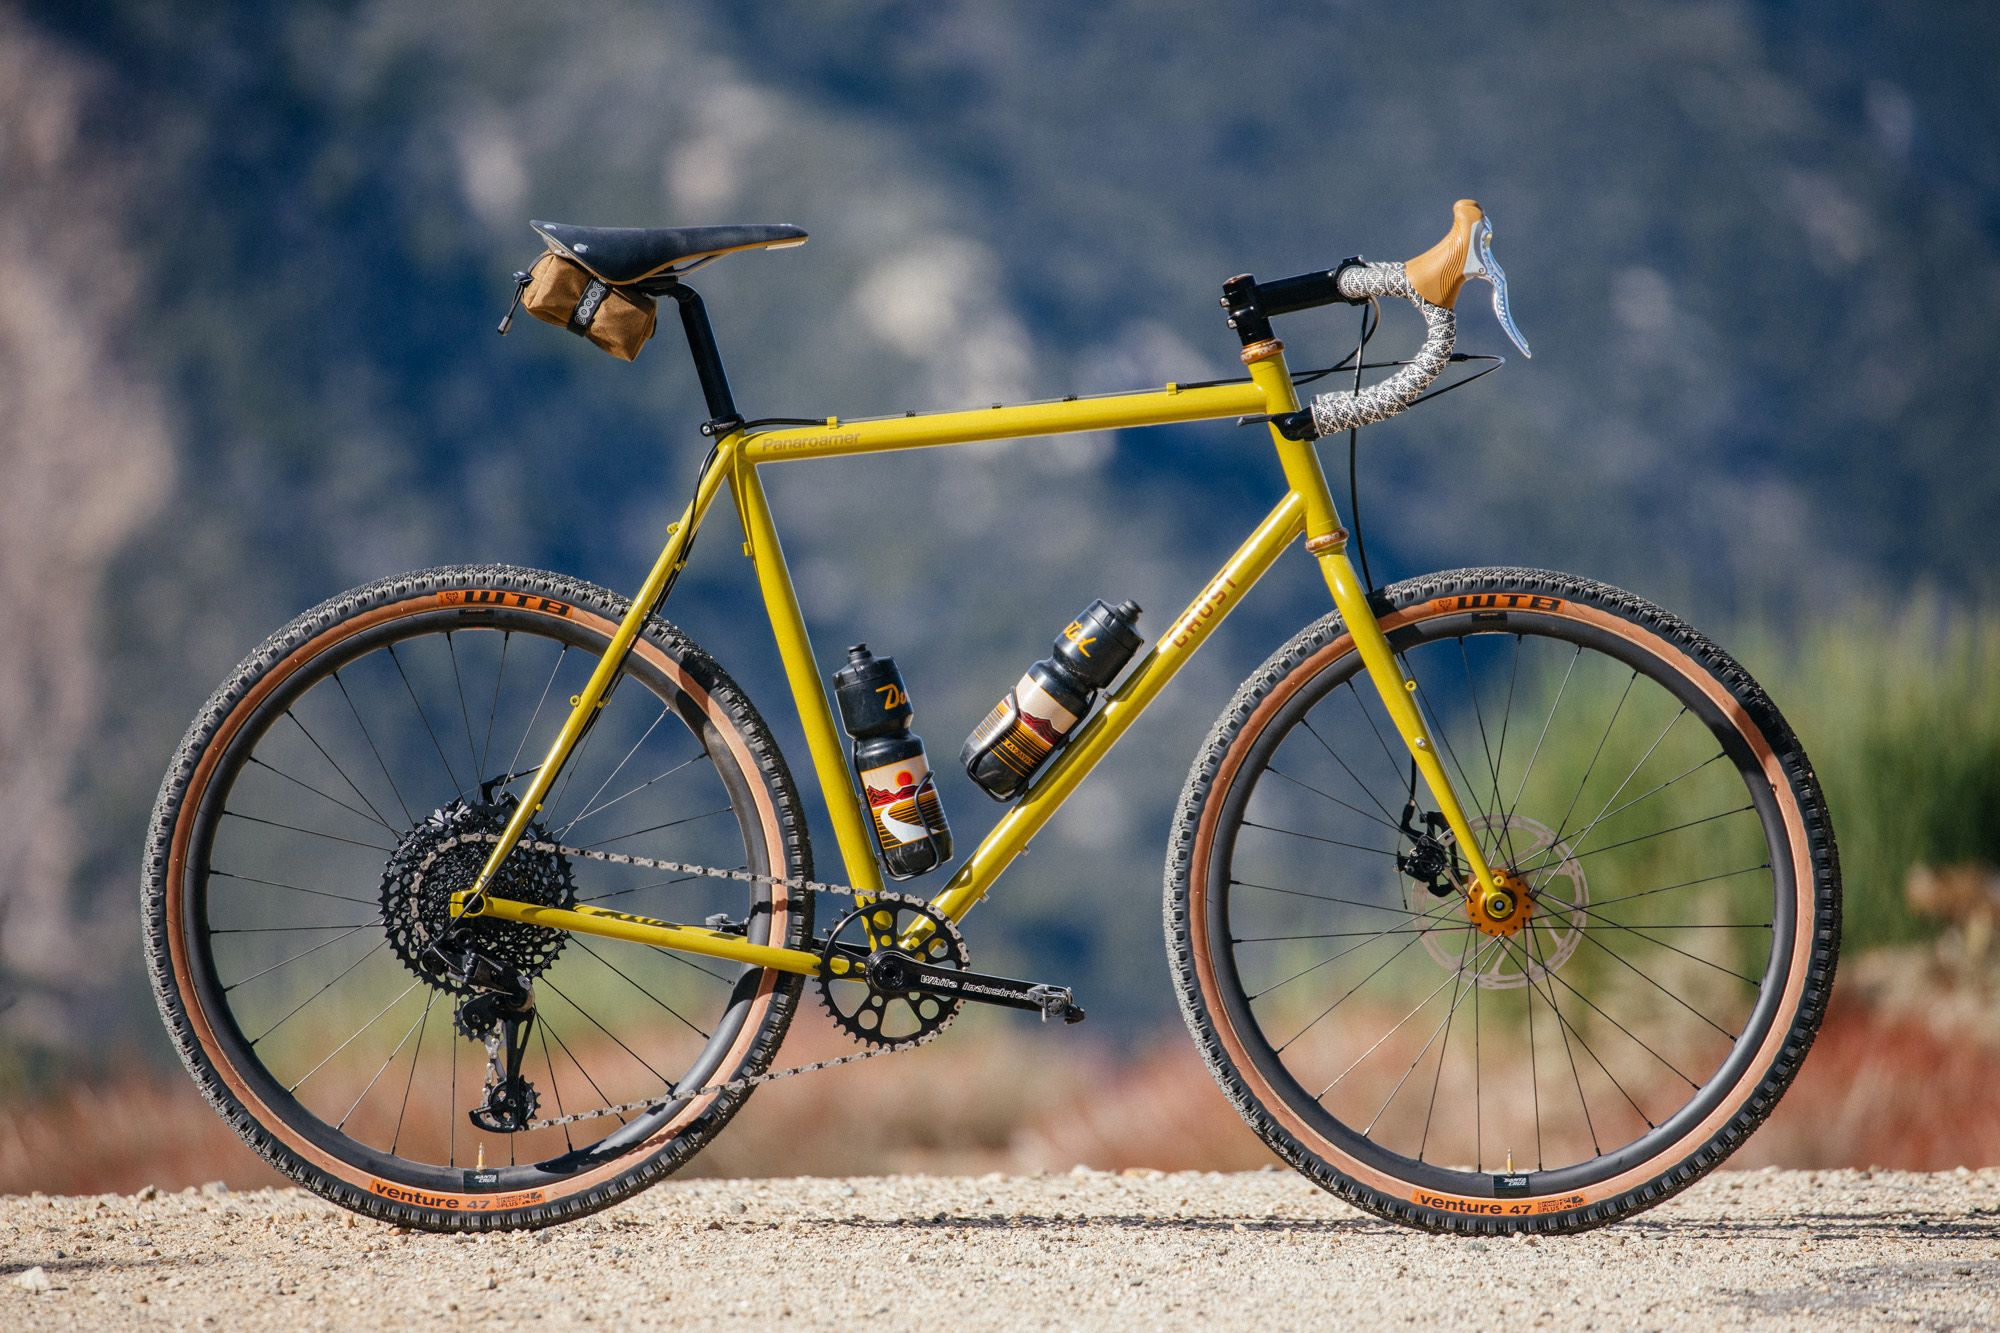 John S Crust Bikes Dreamer Is An All Road Light Tourer Bike Touring Bike The Dreamers